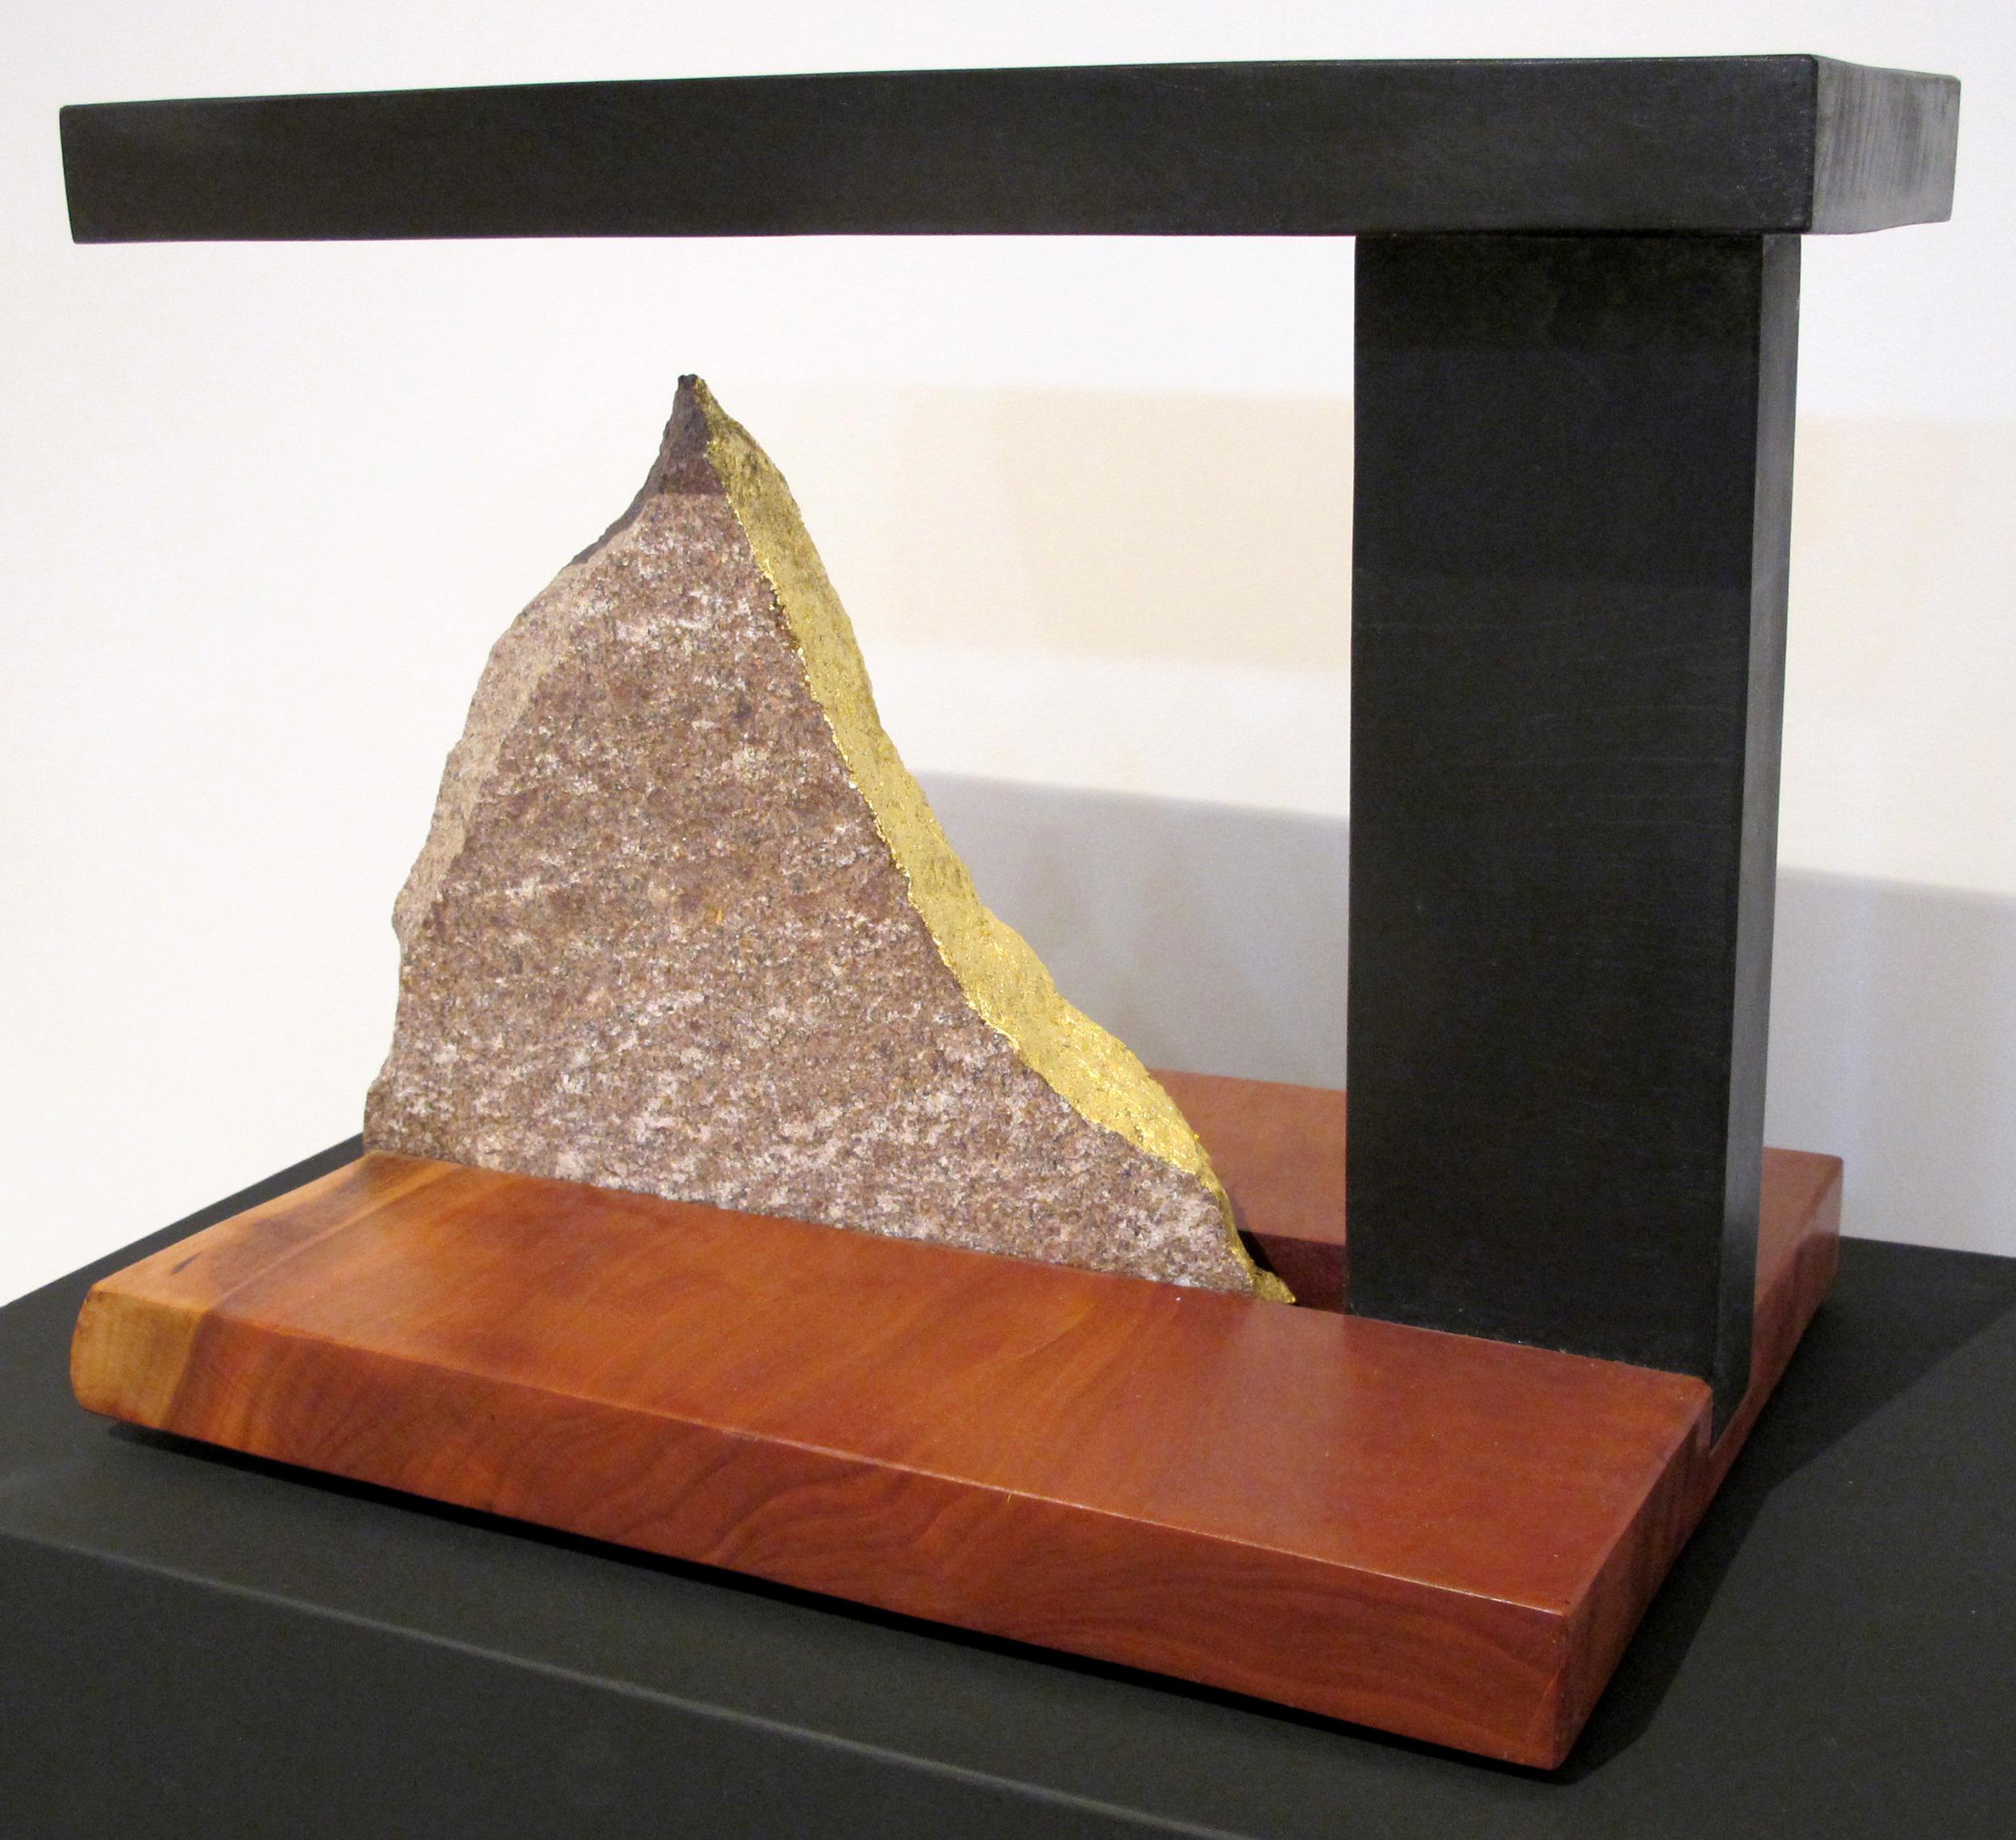 "Granite Gold  Jeffrey Brosk JB157 Granite, Cherry Wood, Black Stain 15"" x 12"" x 18"""